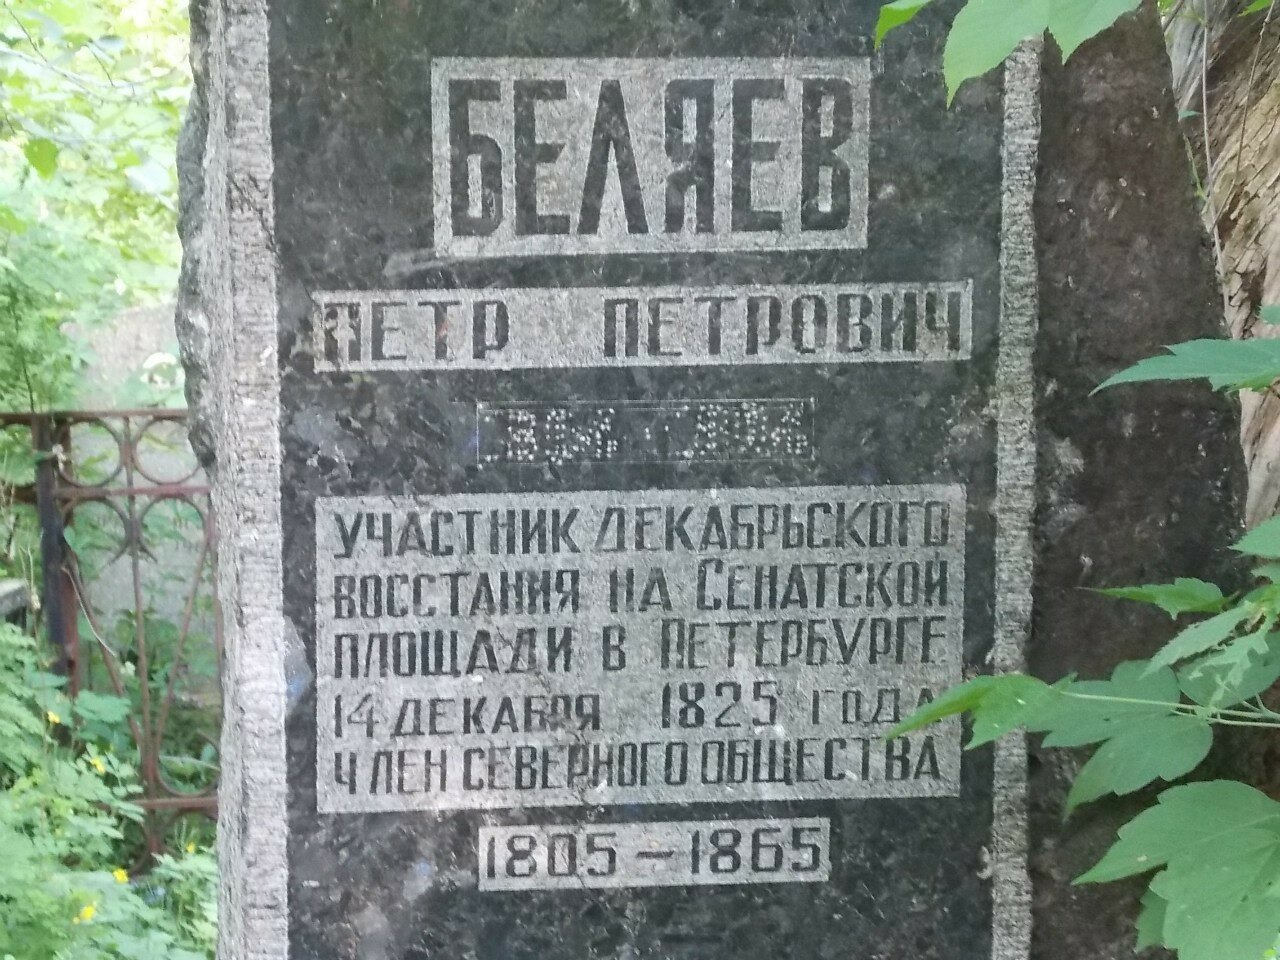 https://img-fotki.yandex.ru/get/1338015/199368979.187/0_26e5f6_c50c0366_XXXL.jpg